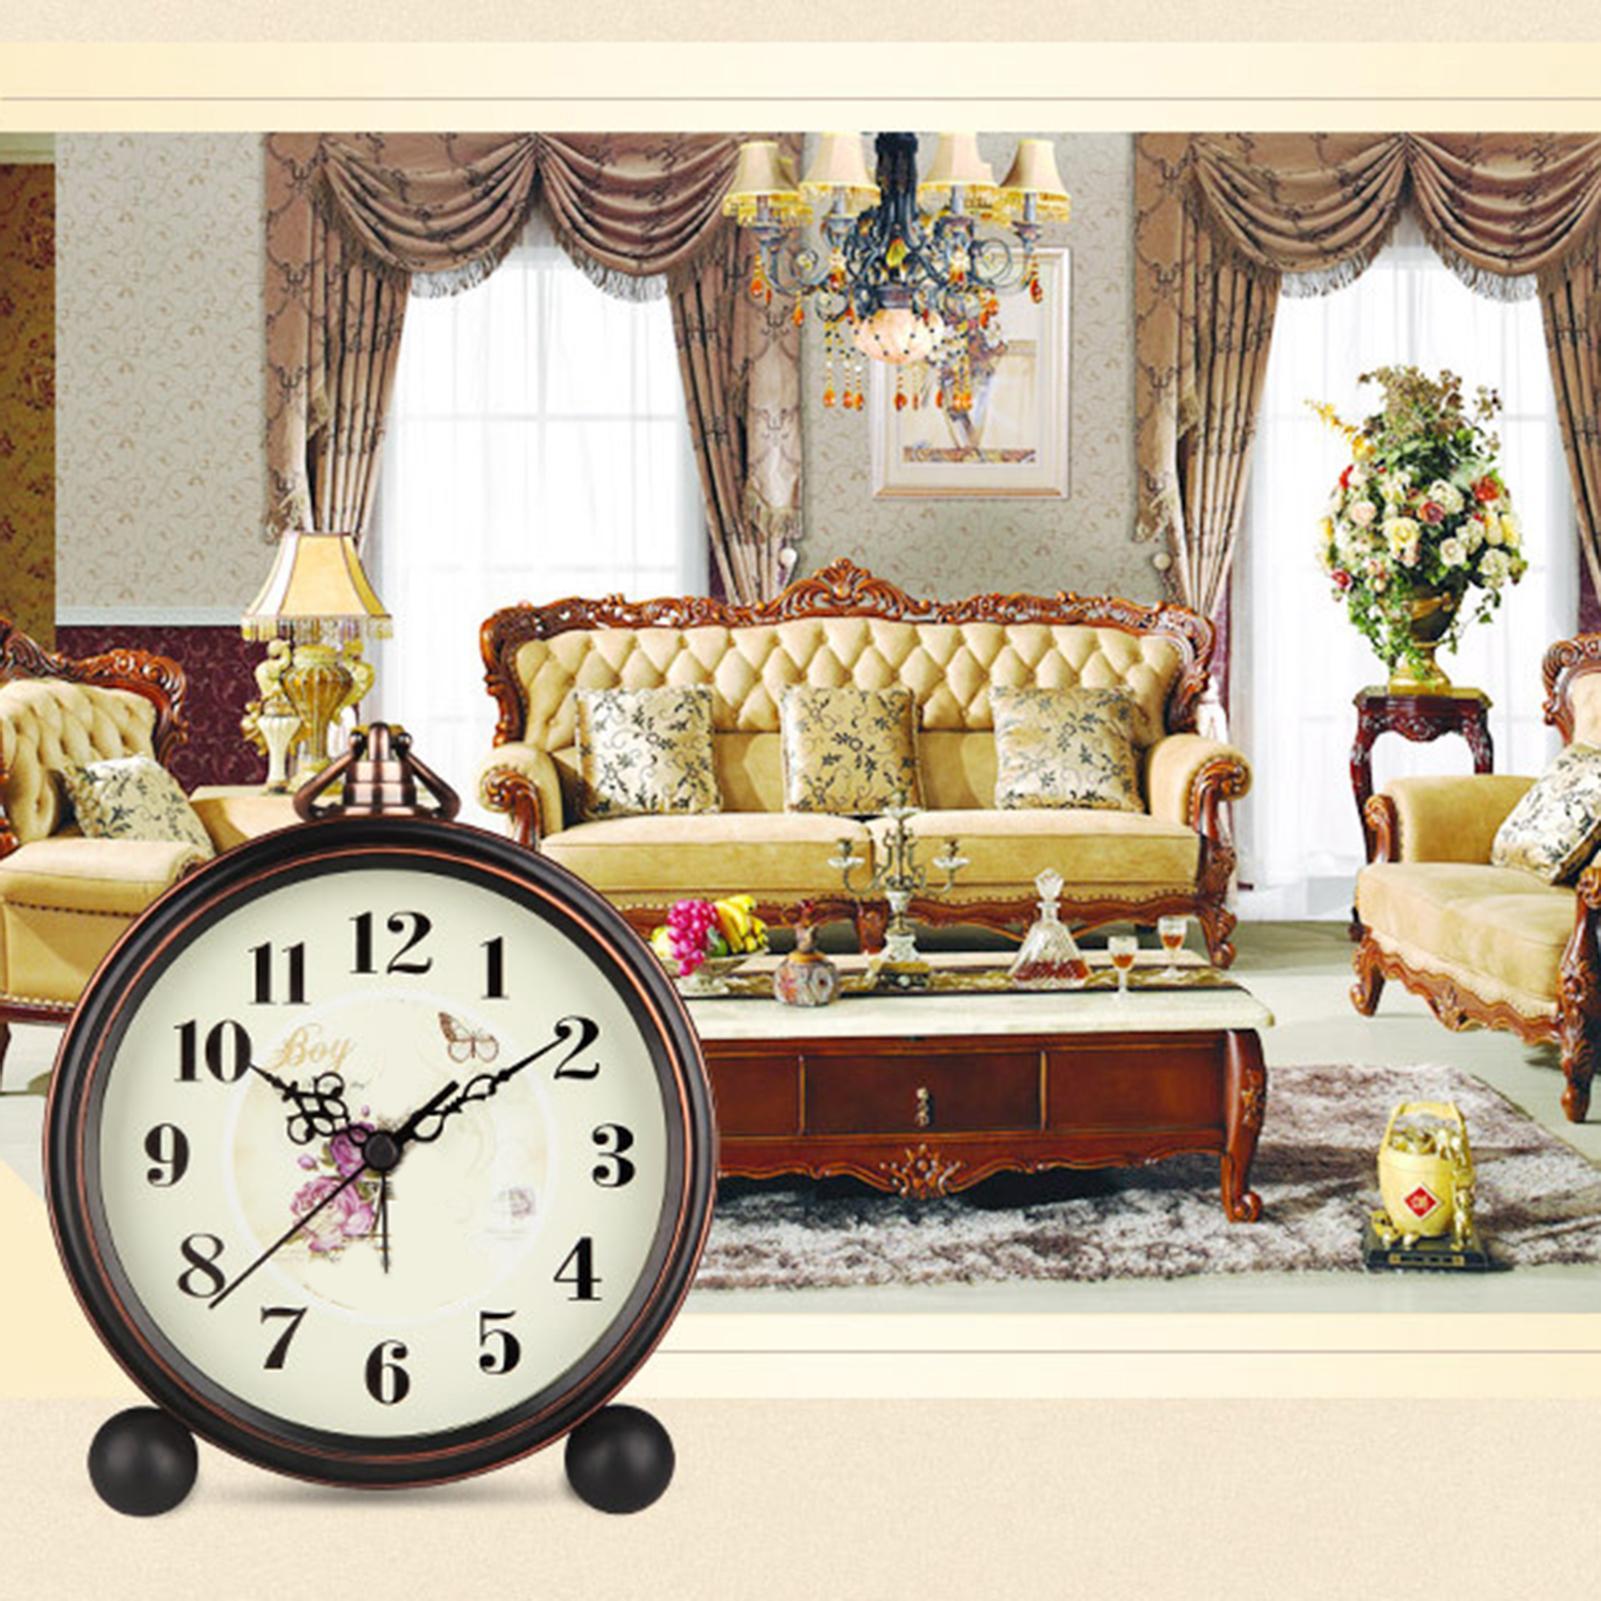 2020 new Vintage Desktop Metal Flower Bird Pattern Silent Alarm Clock with Hollow Pointer Desk Table Bedroom Electronic Clocks